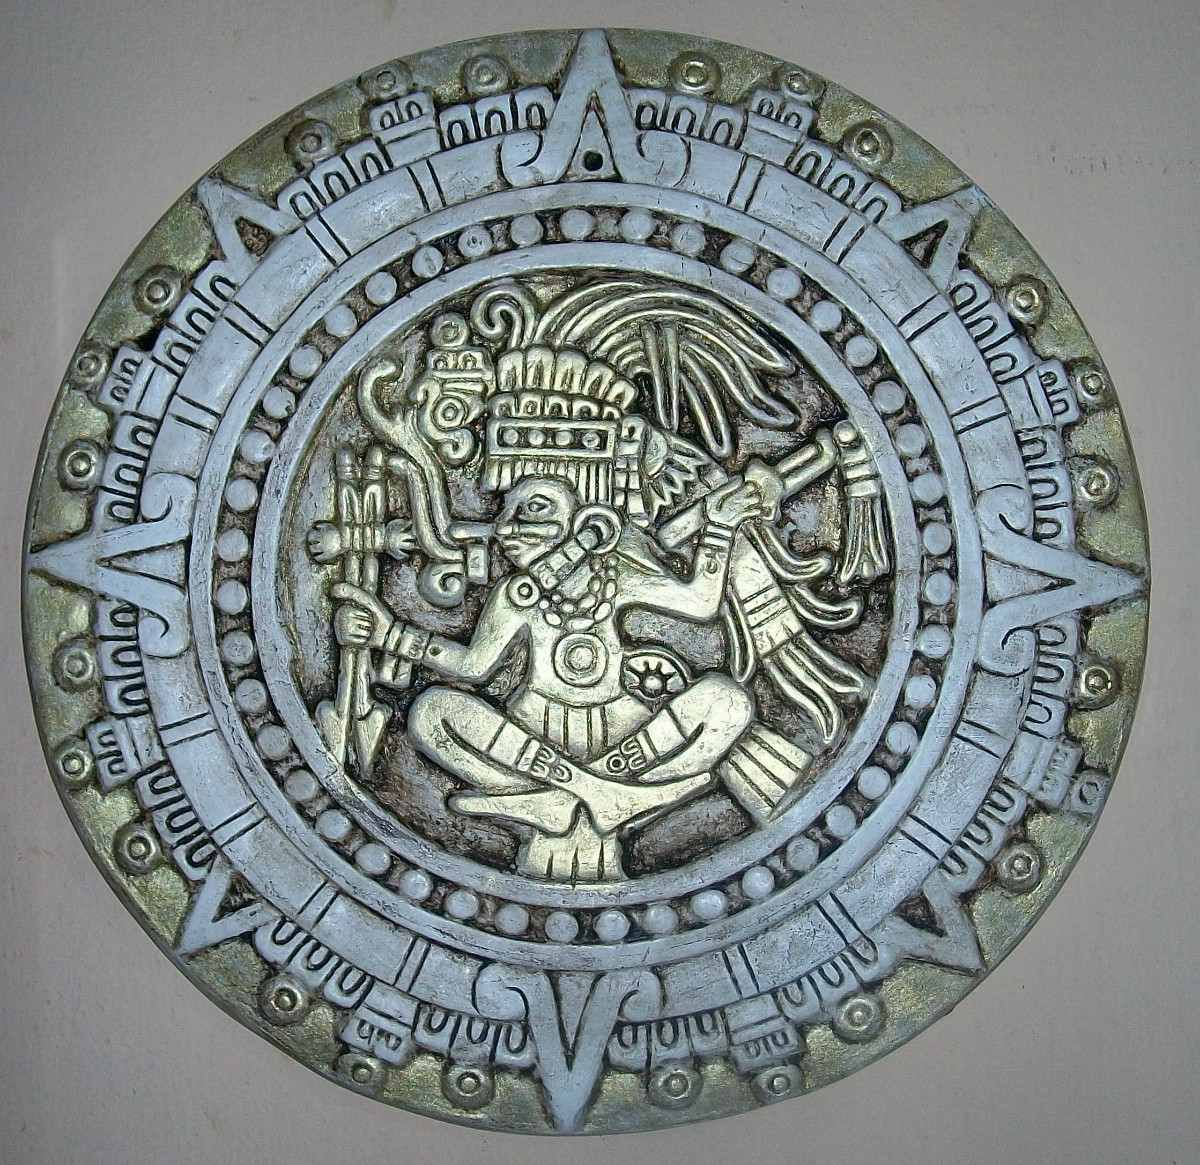 b43ec5e67 calendarios maya y azteca - Buscar con Google | Tattoo | Mayan ...